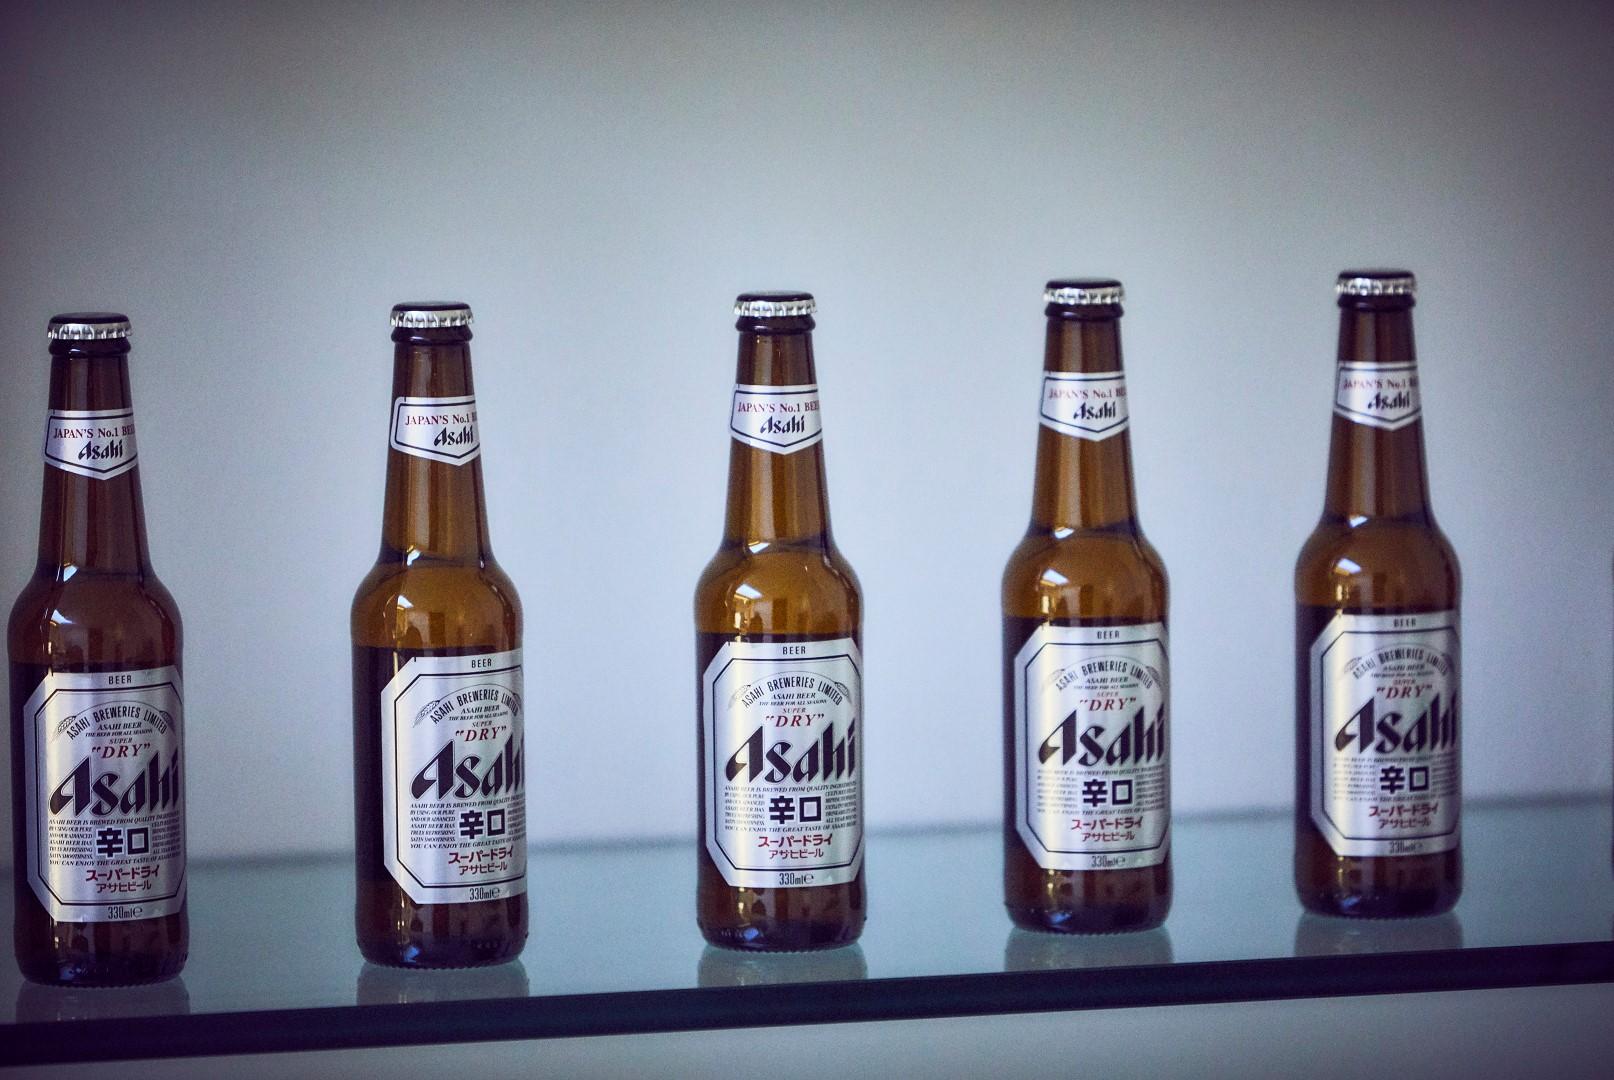 Asahi birra Super Dry